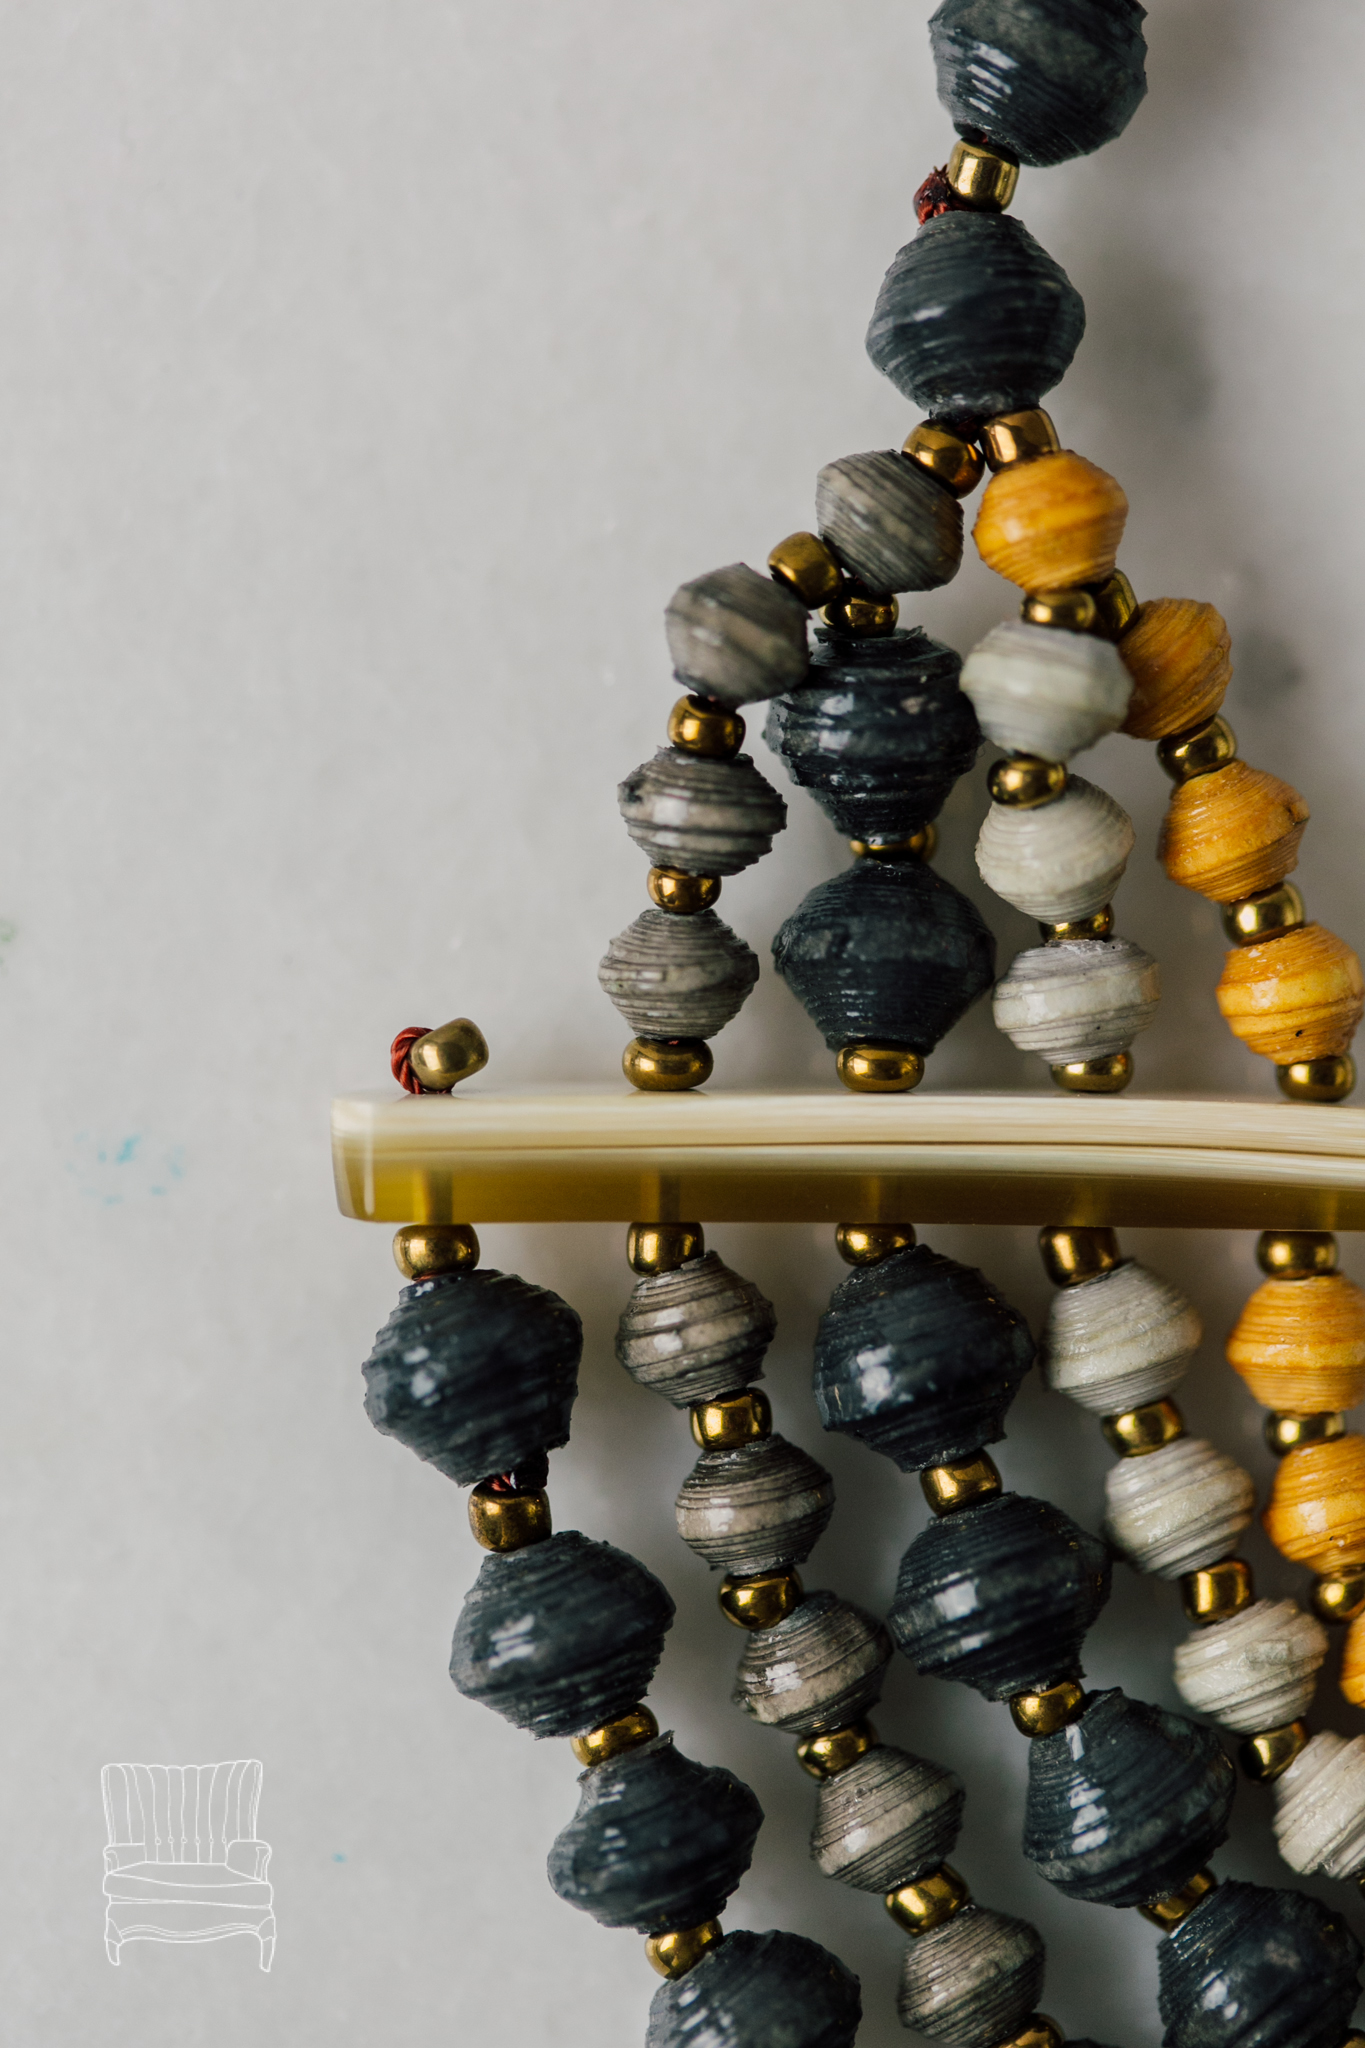 ajuna-jewelry-marketing-photographer-katheryn-moran-fall-2017-8.jpg